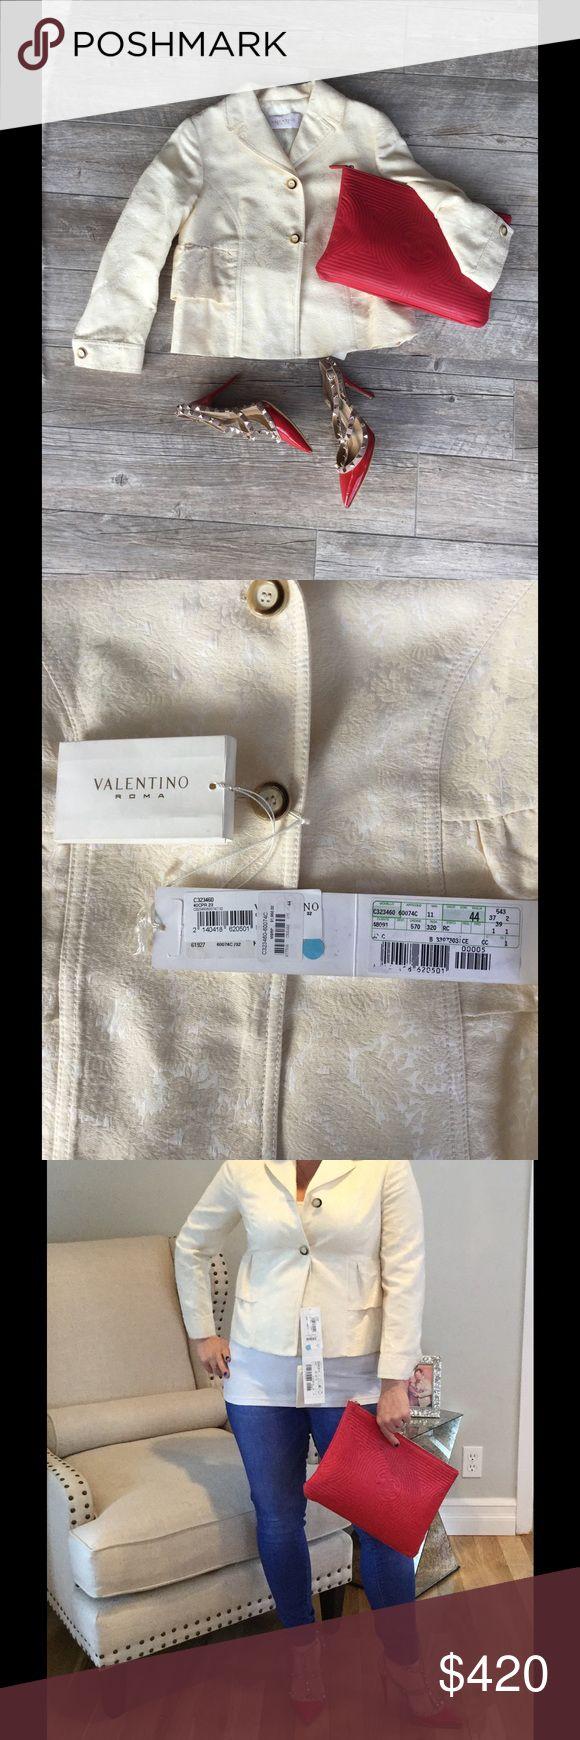 🙀NWT🙀 Valentino Blazer Extremely versatile cream colored NWT Valentino blazer. Size 8 (44) can be worn casual or dressy you decided! Valentino Jackets & Coats Blazers